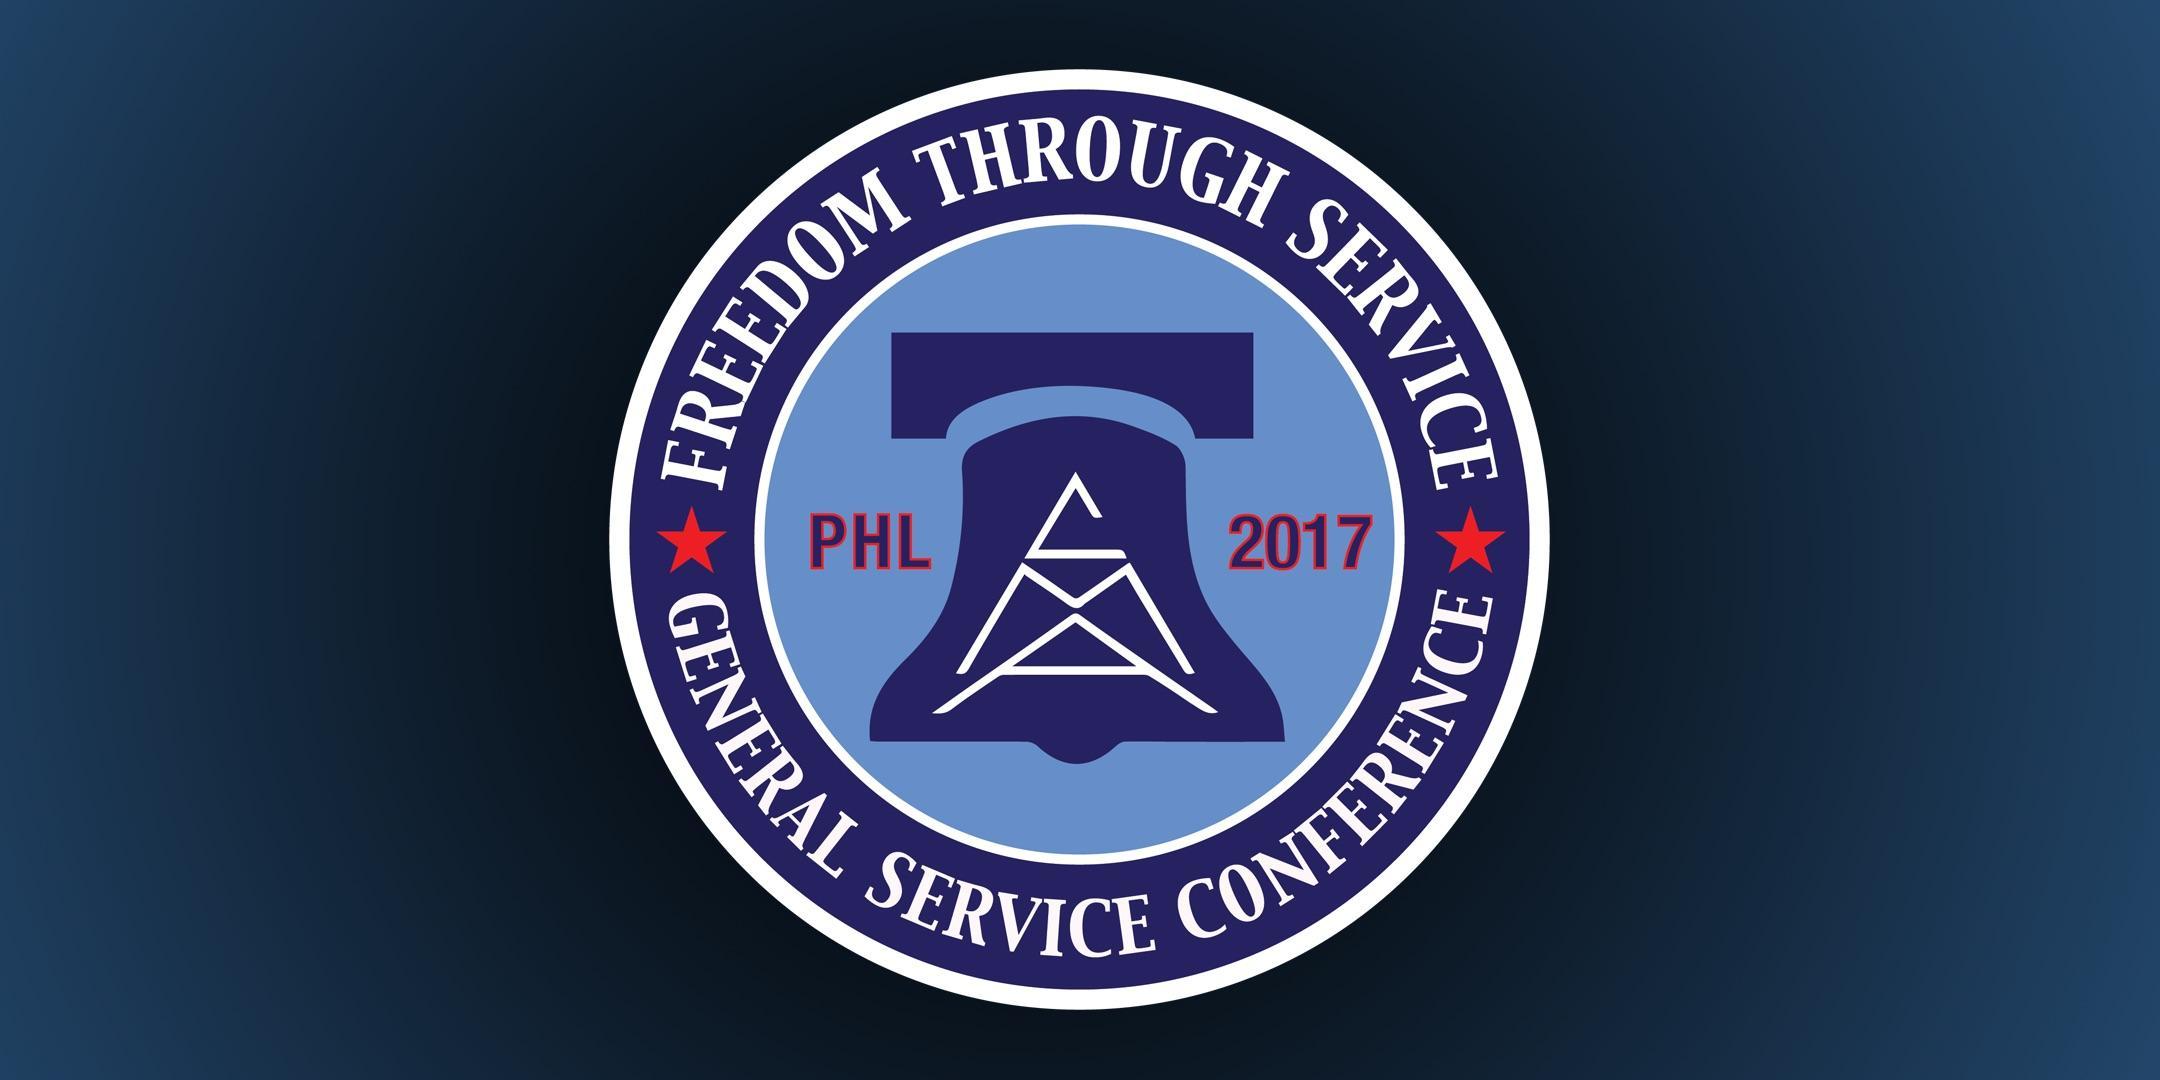 CMA 2017 General Service Conference - Philade